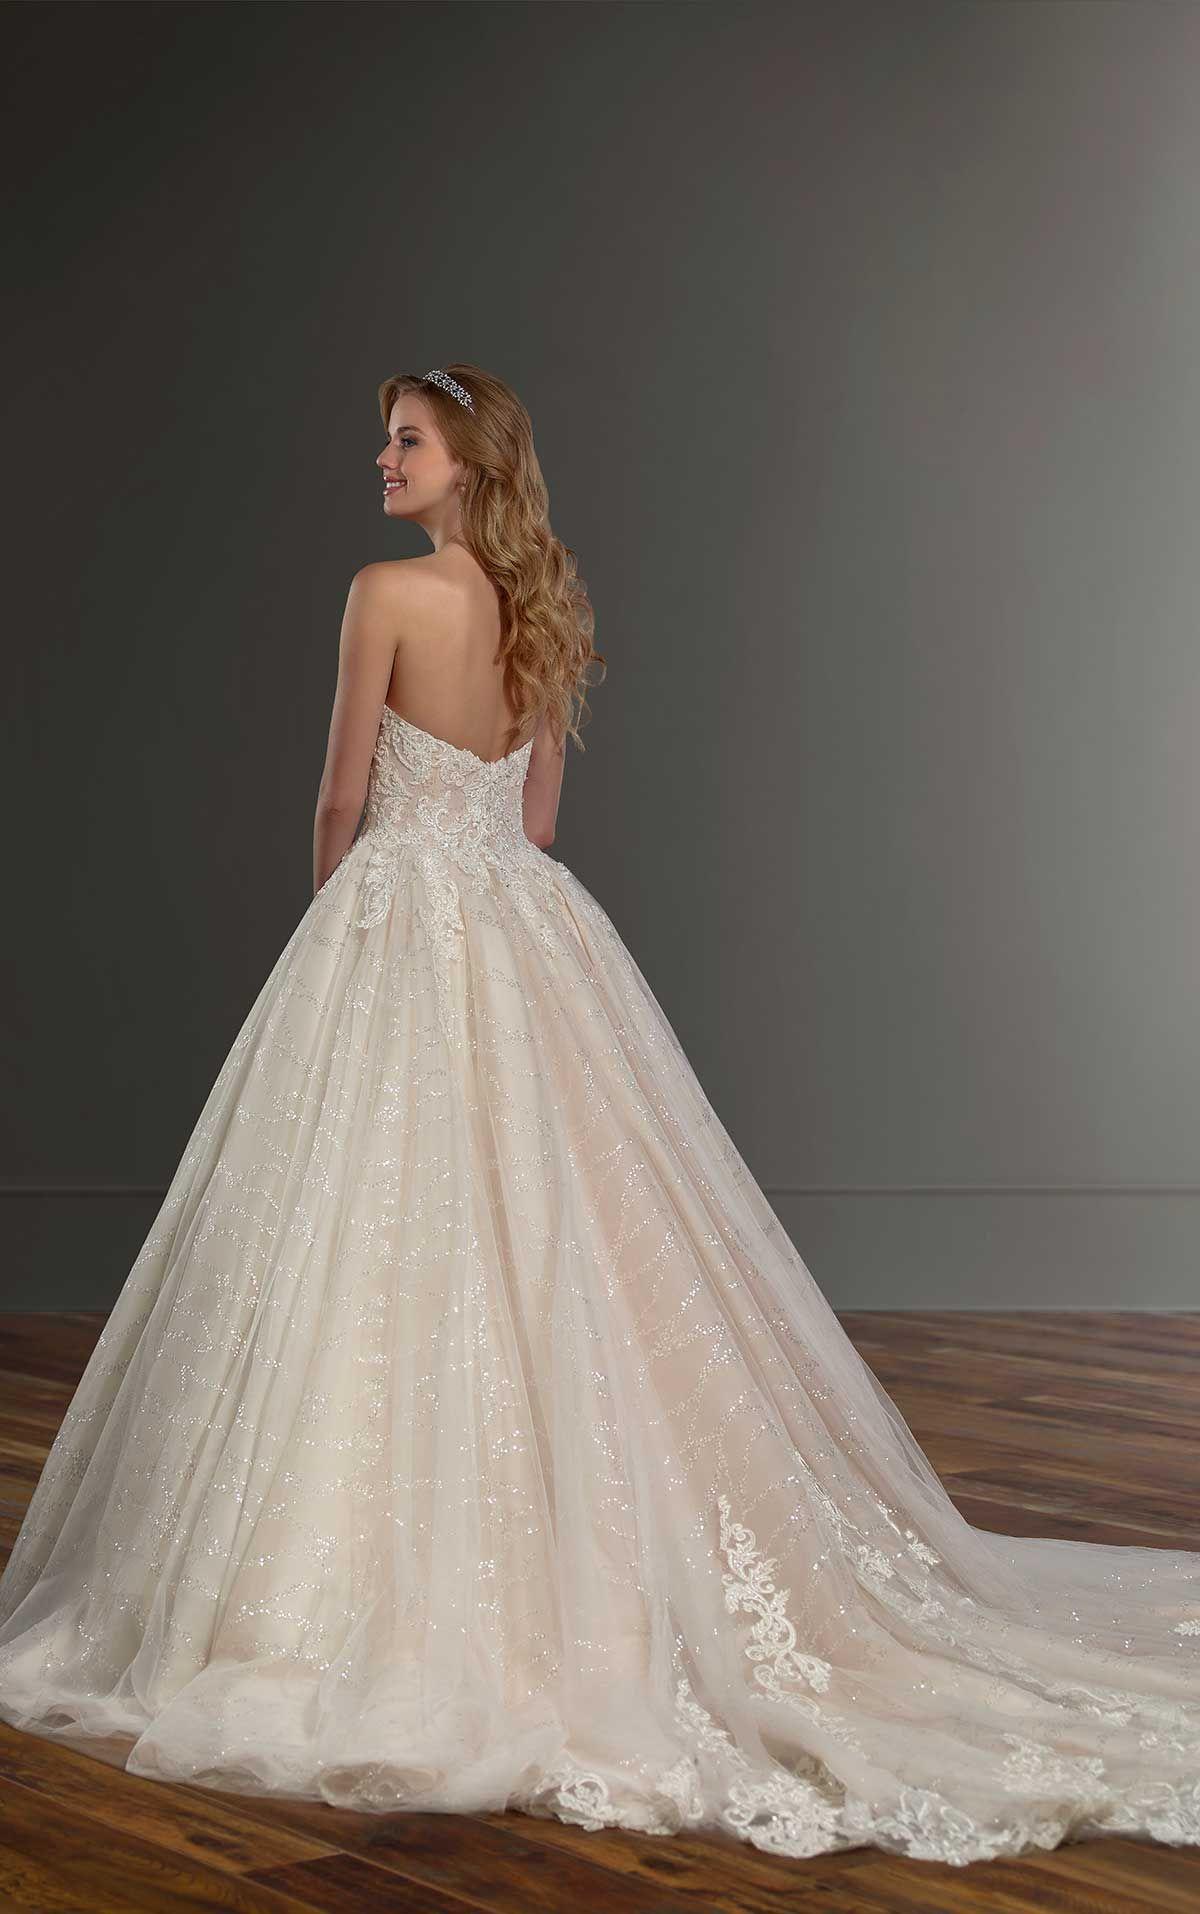 Martina Liana 1026 dress. Princess, ballgown style dress